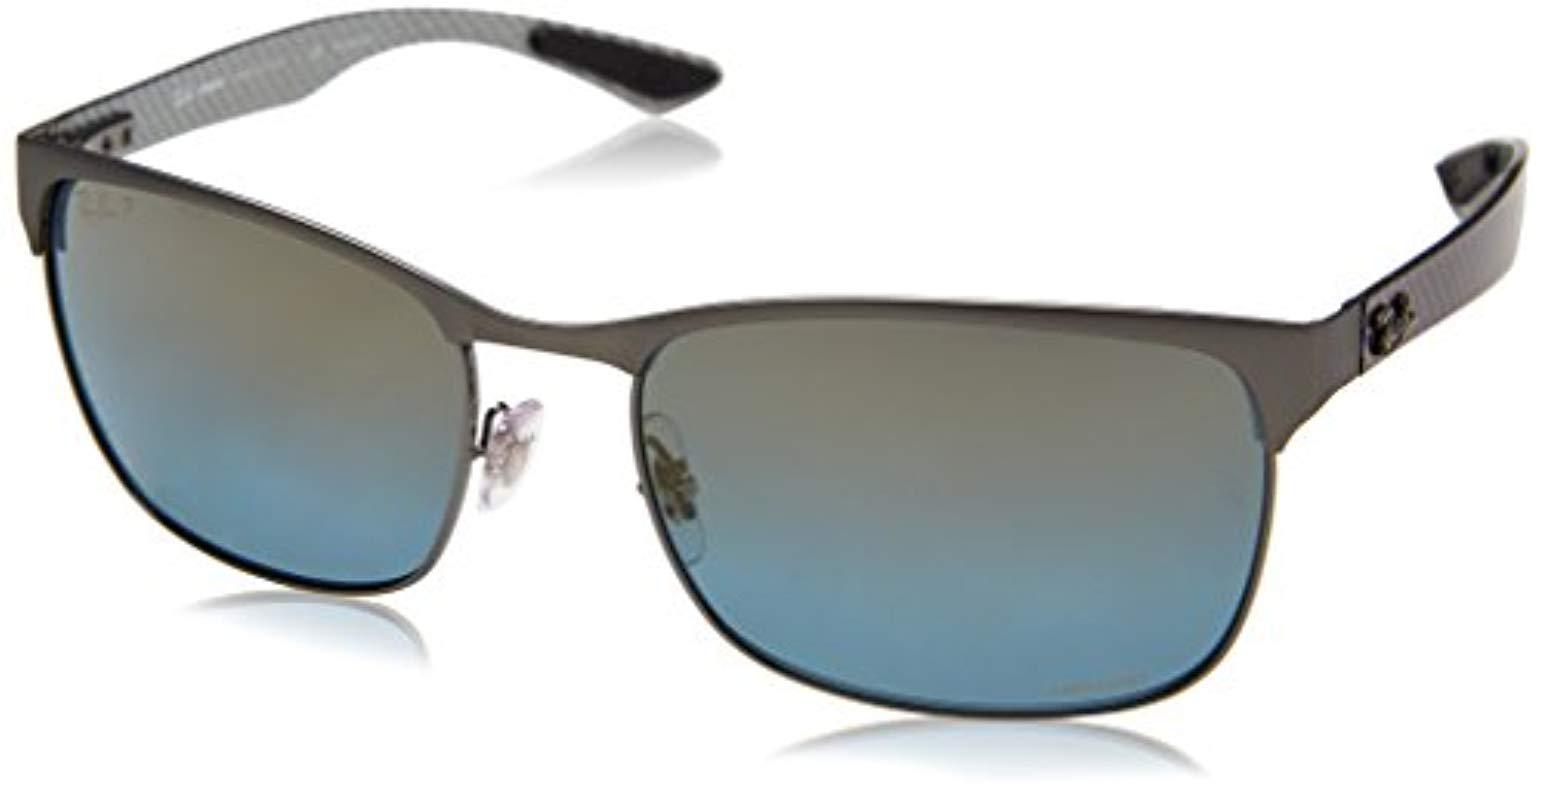 35f284441b Lyst - Ray-Ban Rb8319 Chromance Sunglasses for Men - Save 17%